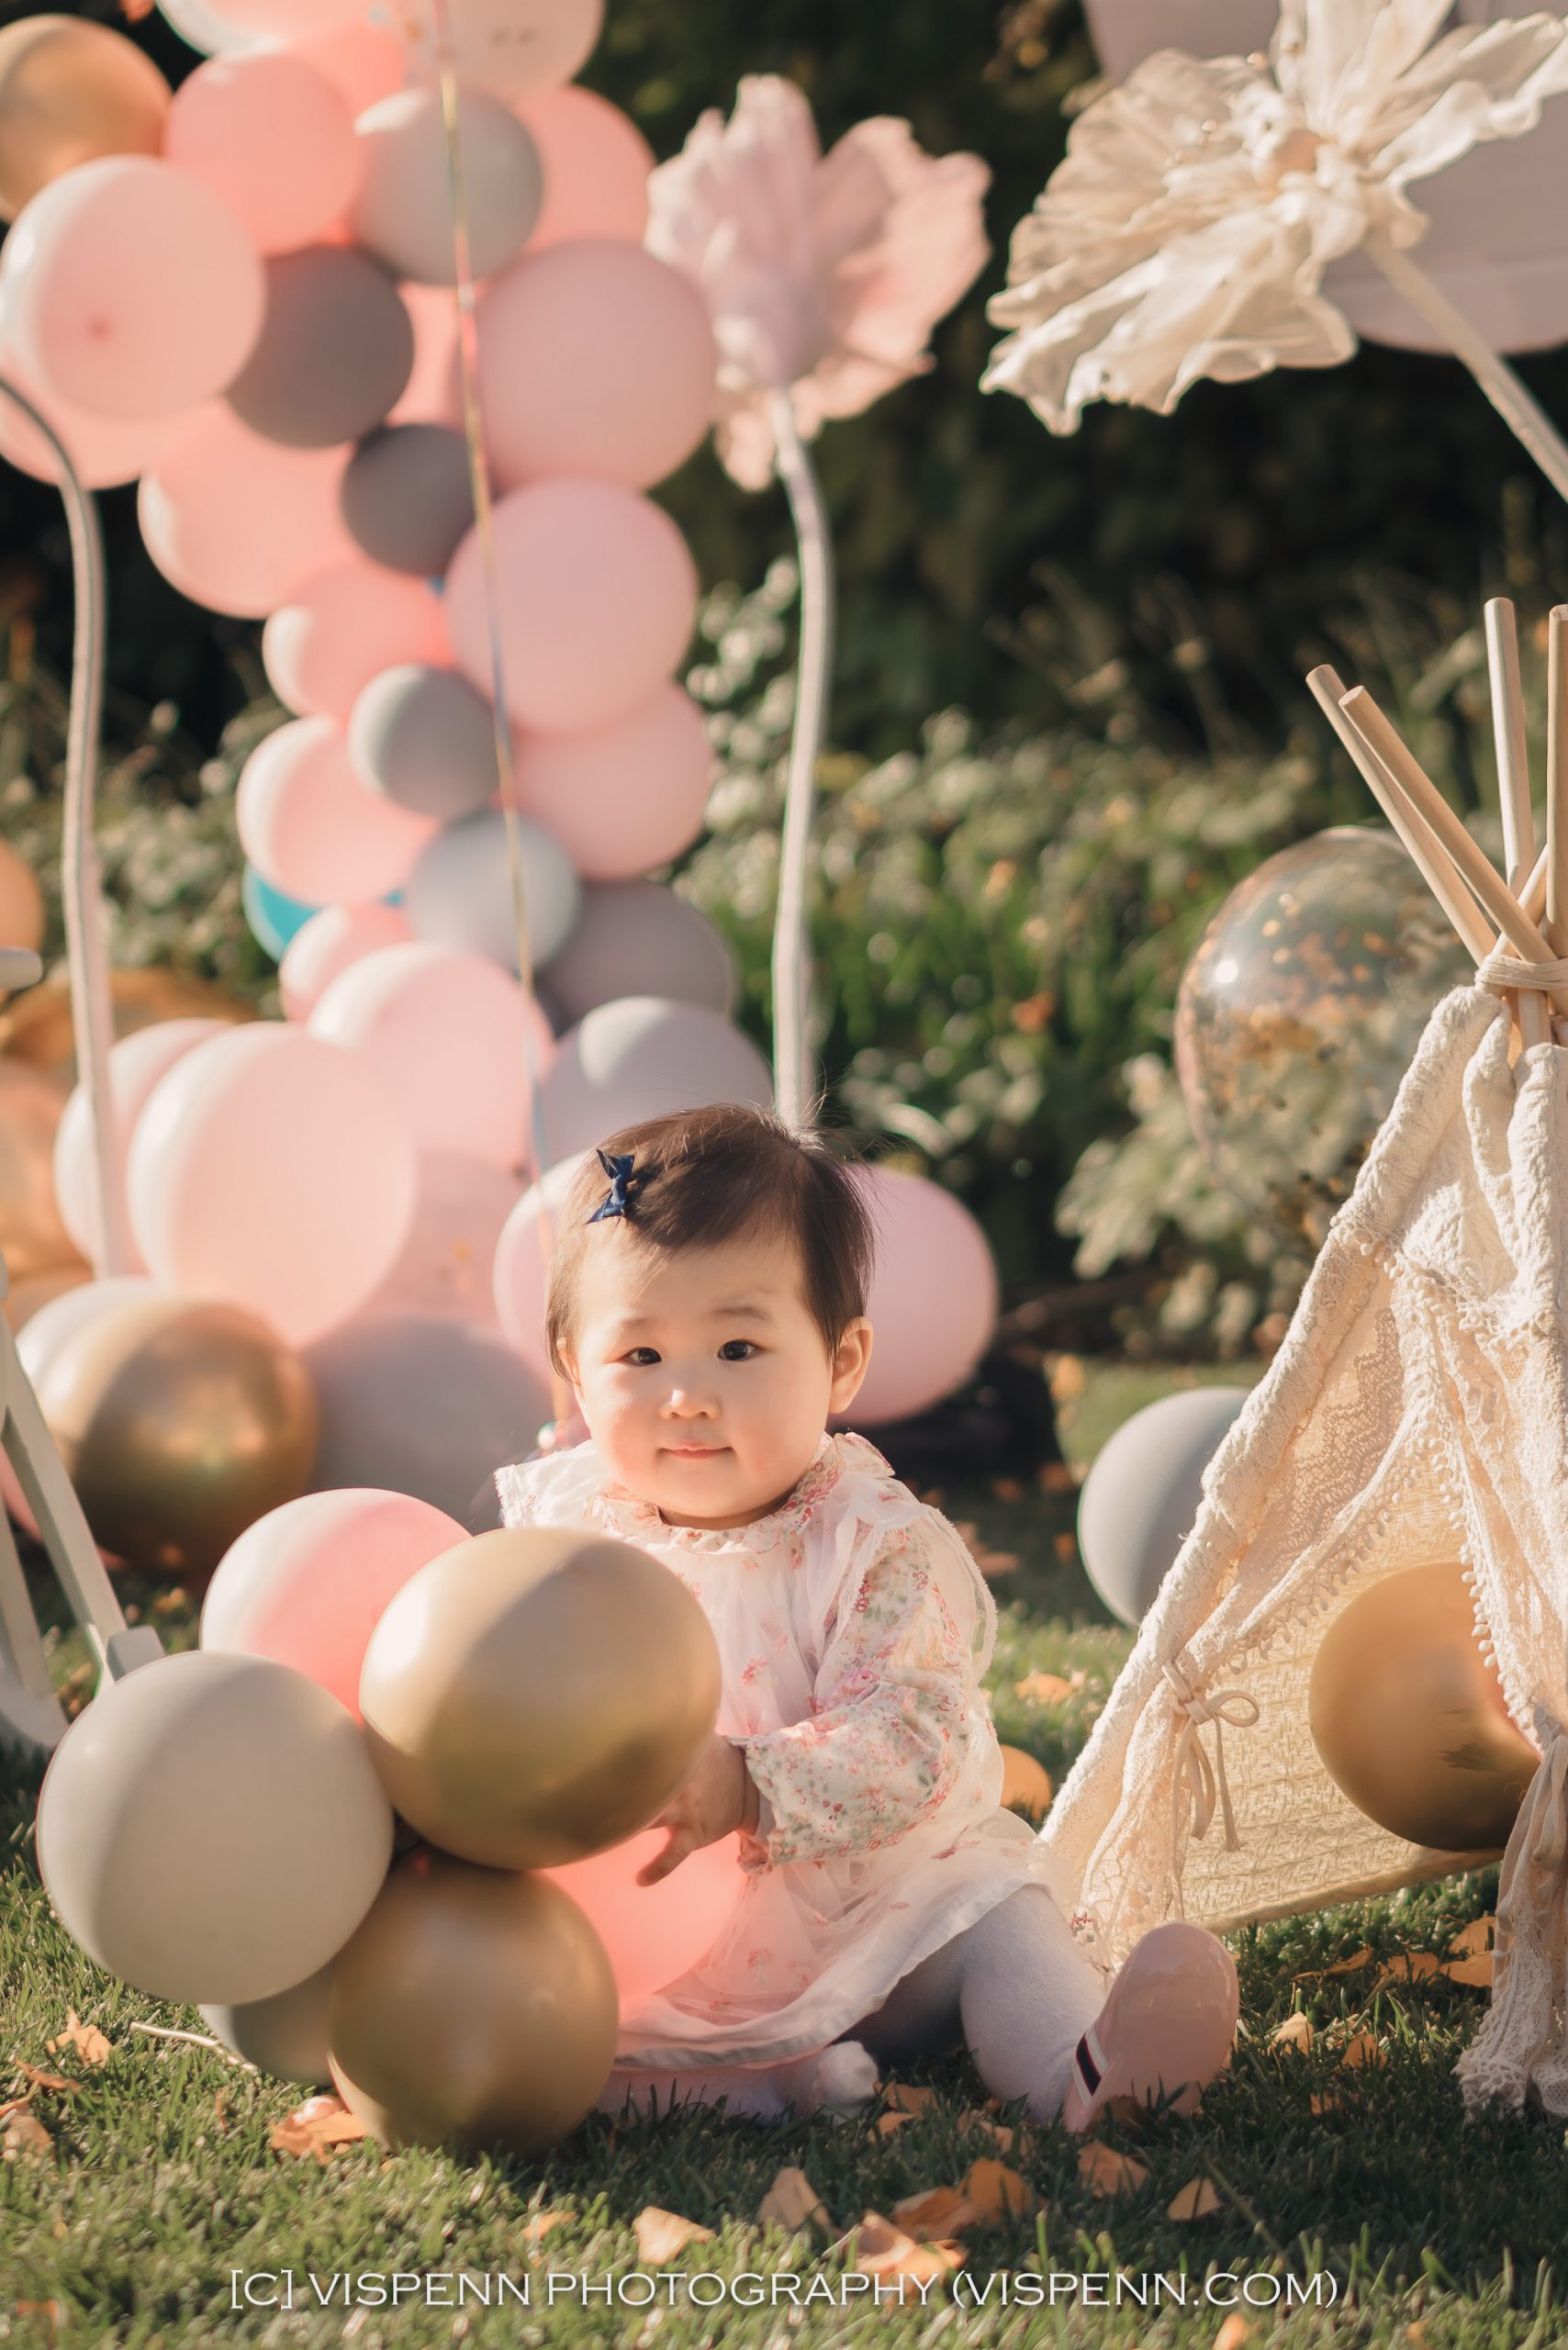 Melbourne Baby Family Birthday Party Photographer 墨尔本 百日宴 满月宴 周岁宴 摄影 VISPENN Jenny 1024 Sony VISPENN